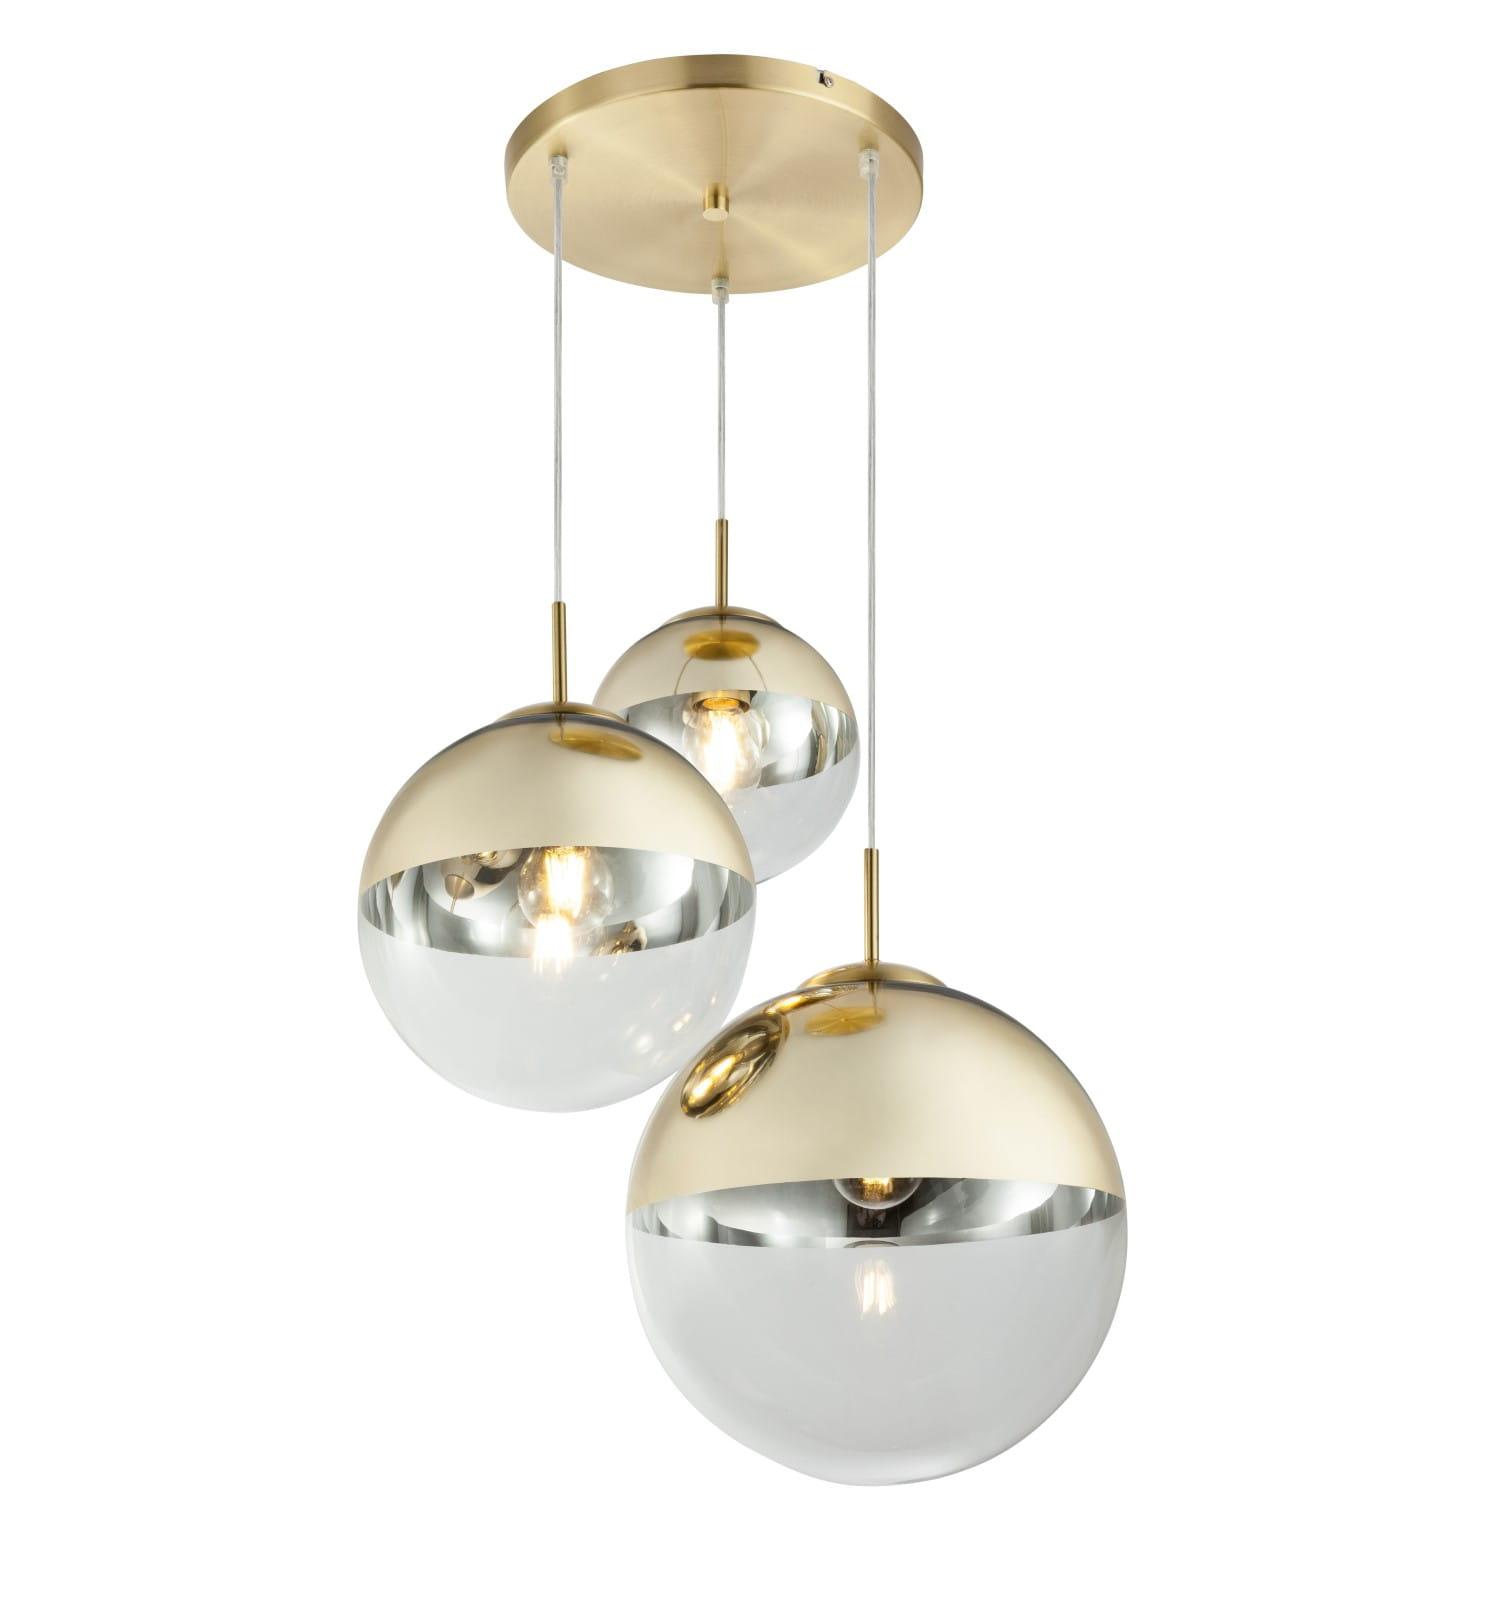 Globo Nowoczesna Lampa Wiszaca Kula Varus 15855 3 Gold Lagunalight E